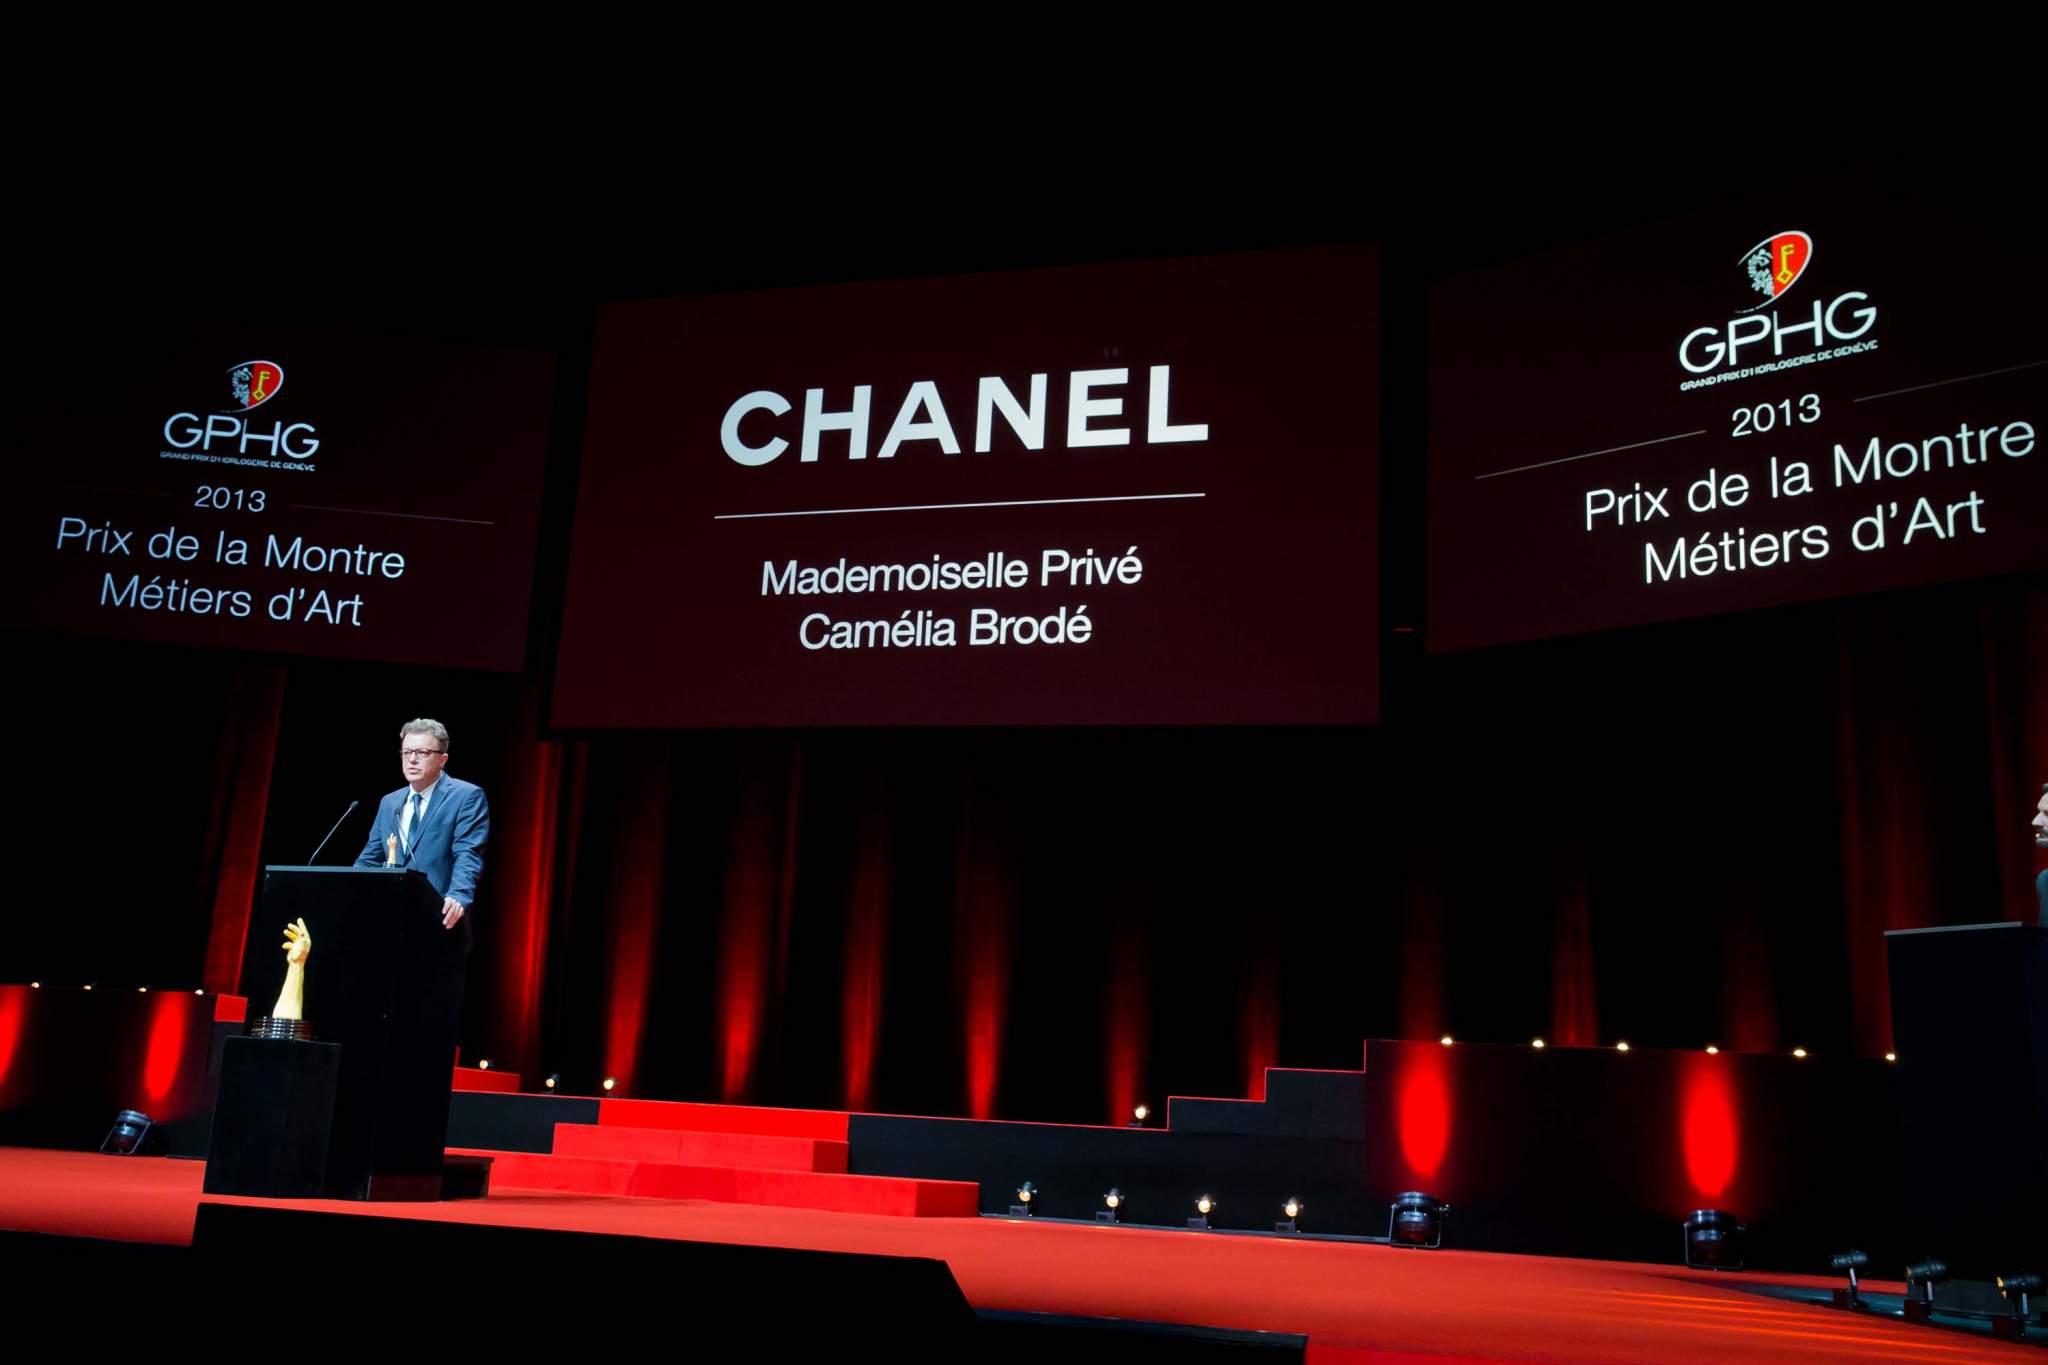 Speech of Nicolas Beau, International watch director of Chanel, winner of the Artistic Crafts Watch Prize 2013